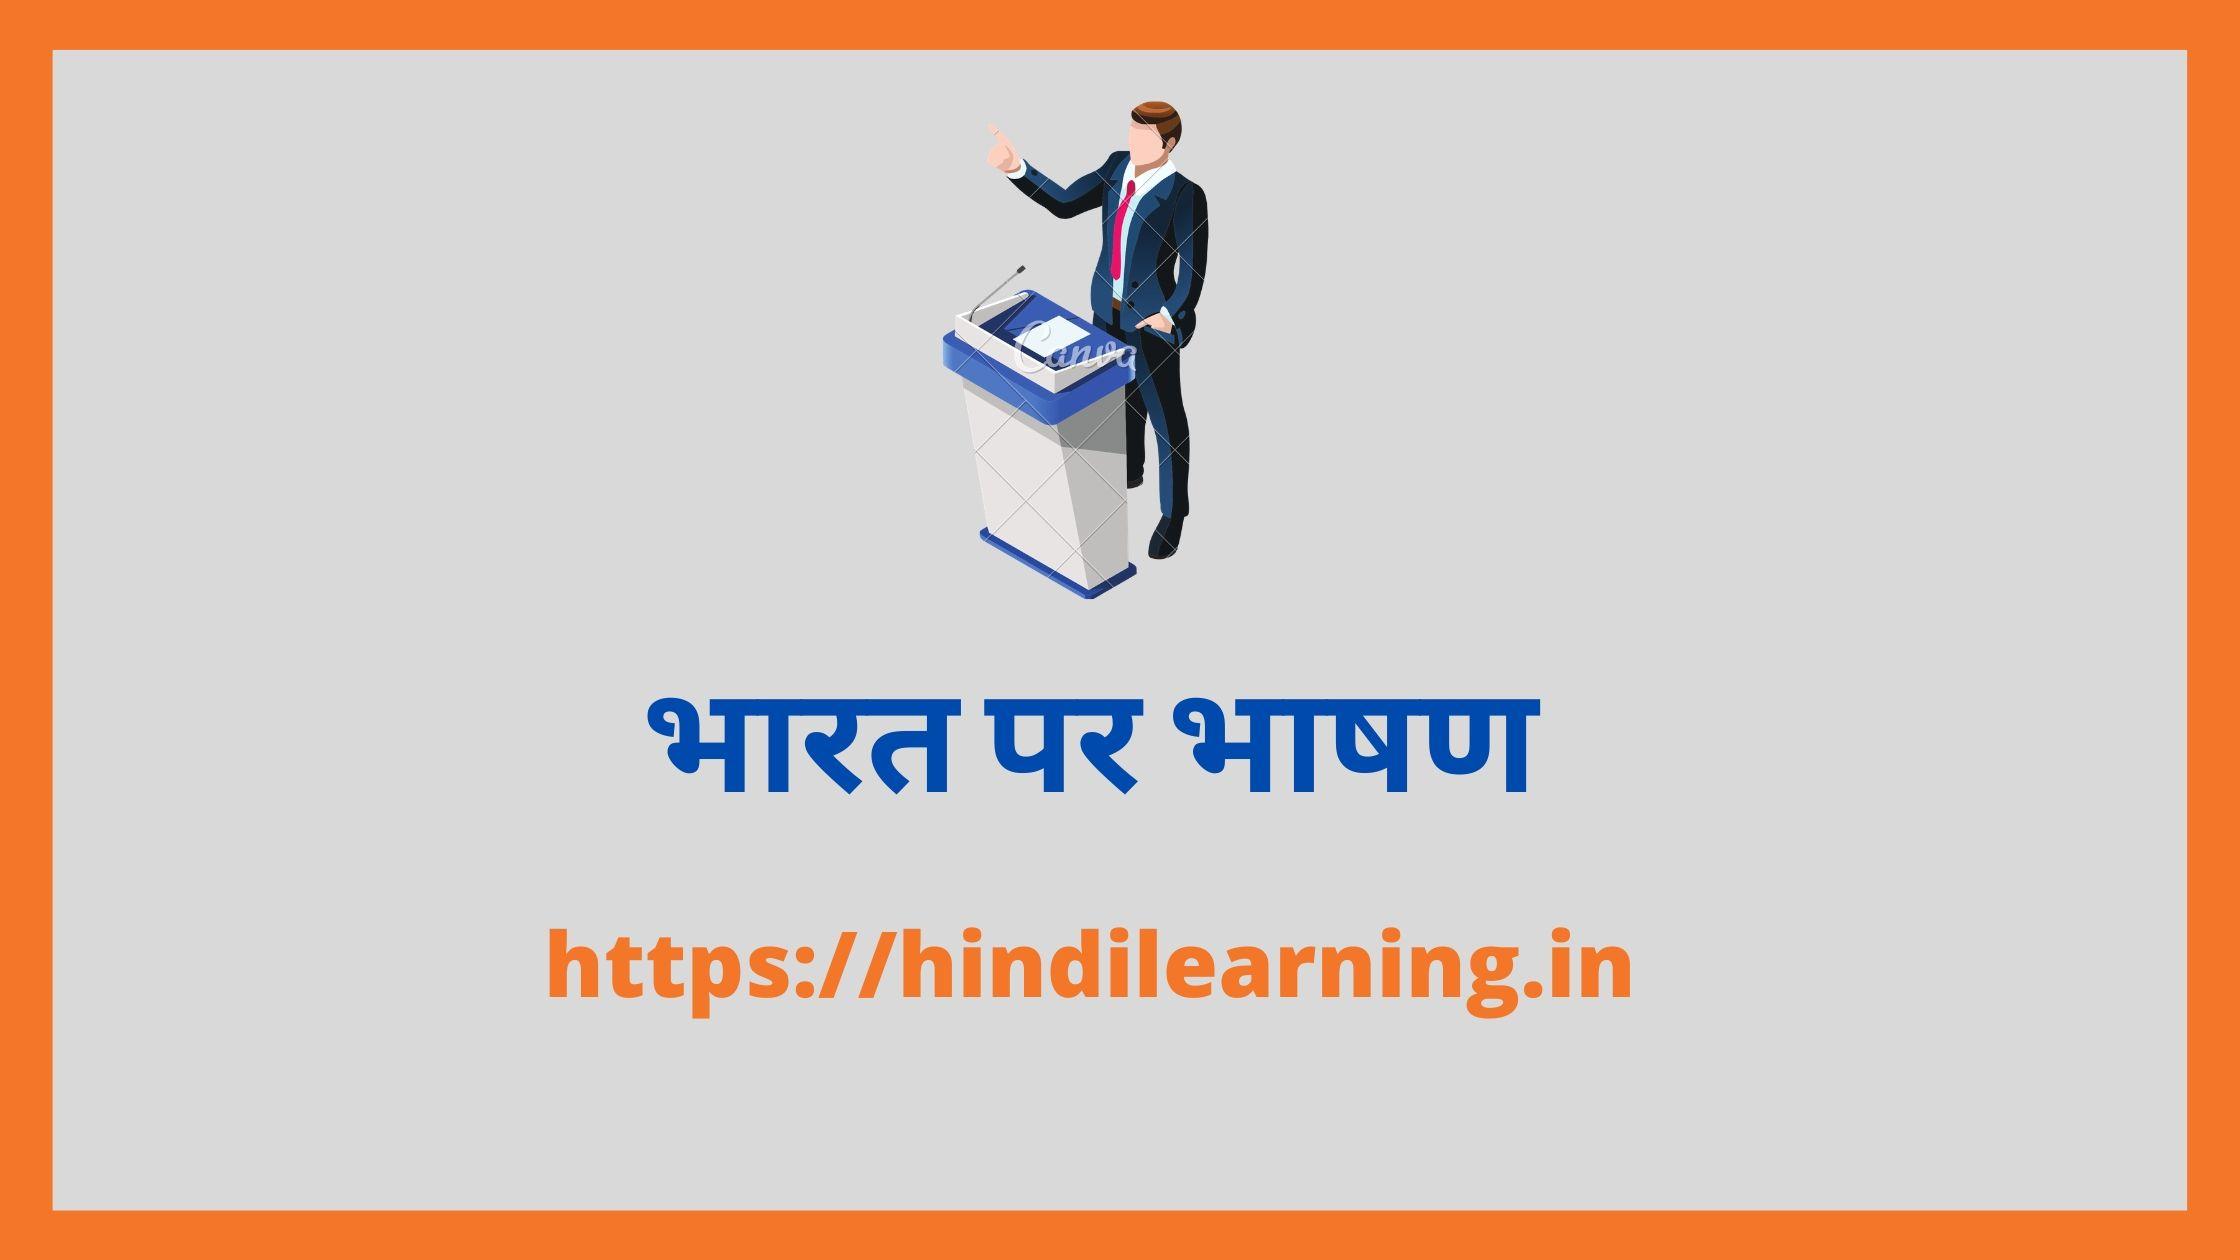 भारत पर भाषण - Speech on India in Hindi